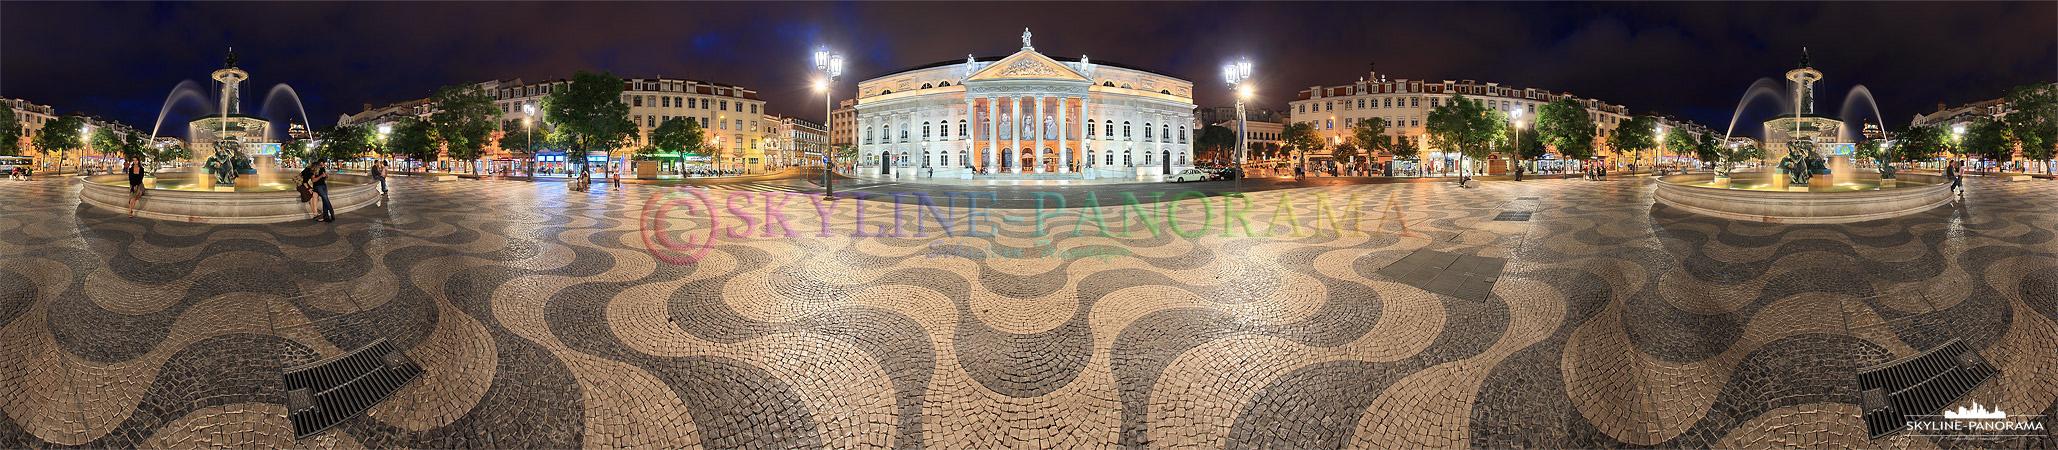 Lissabon Rossio